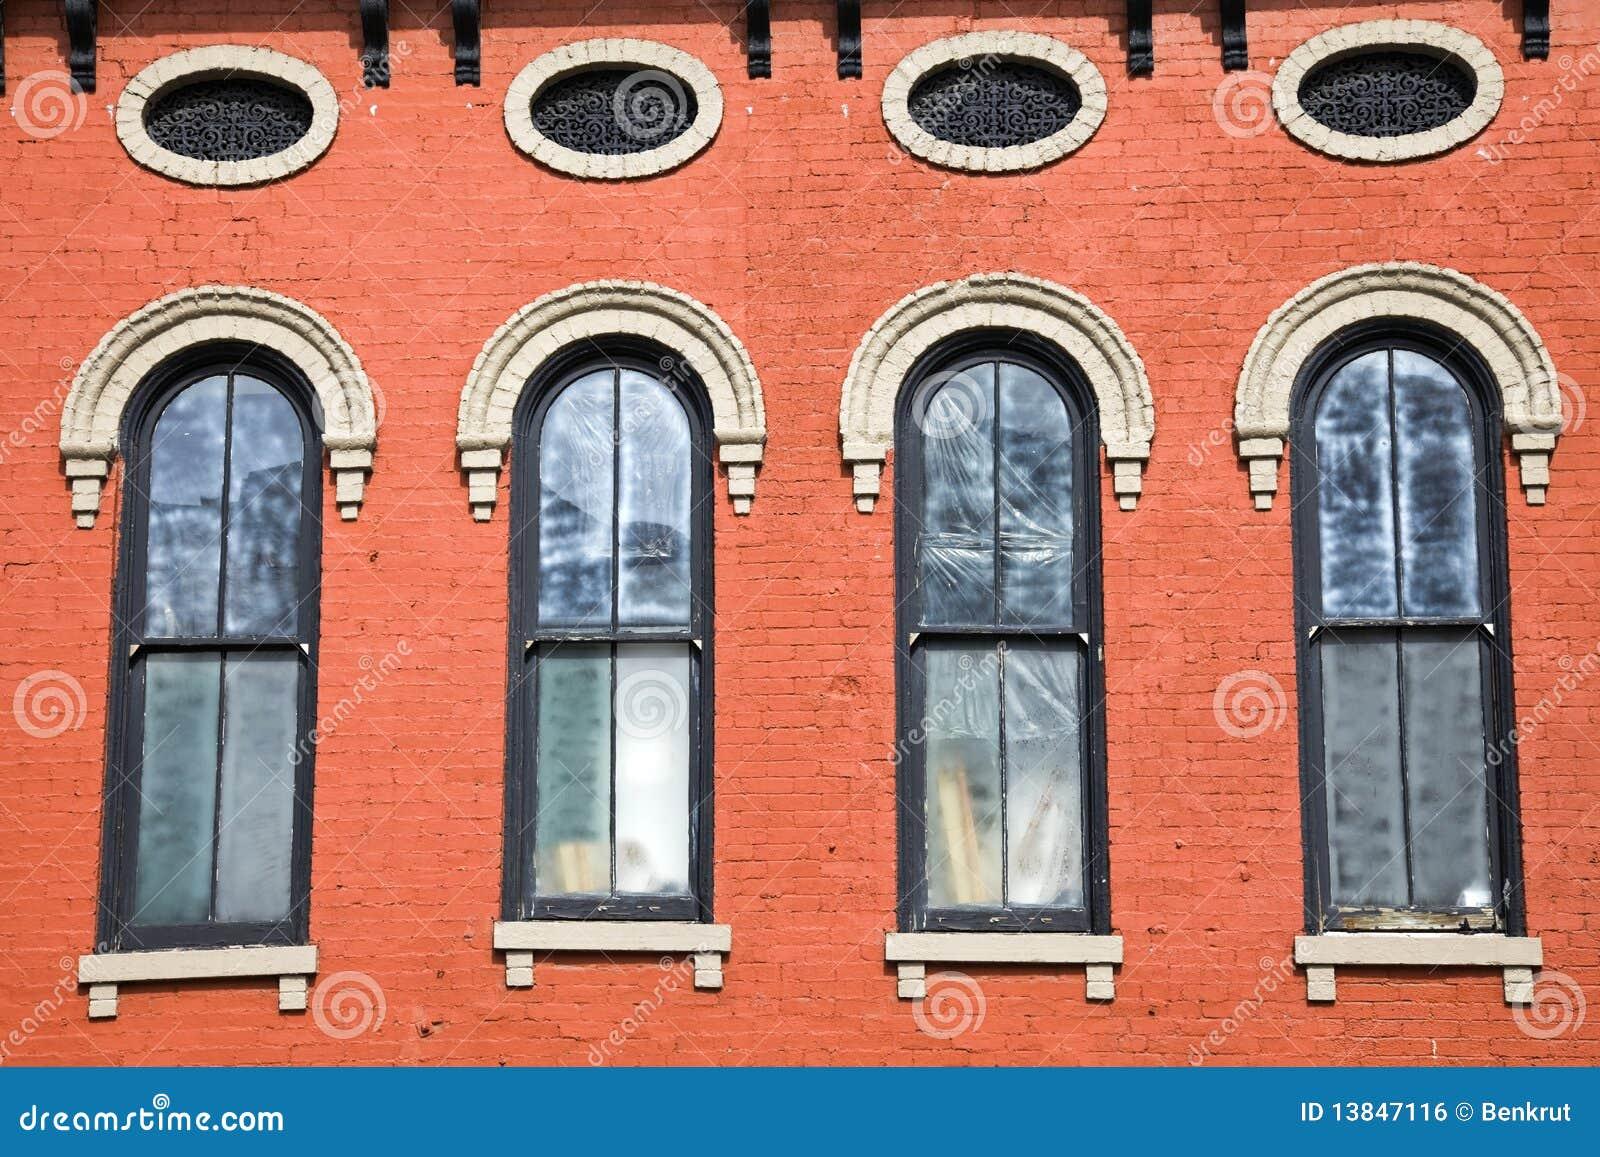 Buntes historisches Gebäude in Lexington